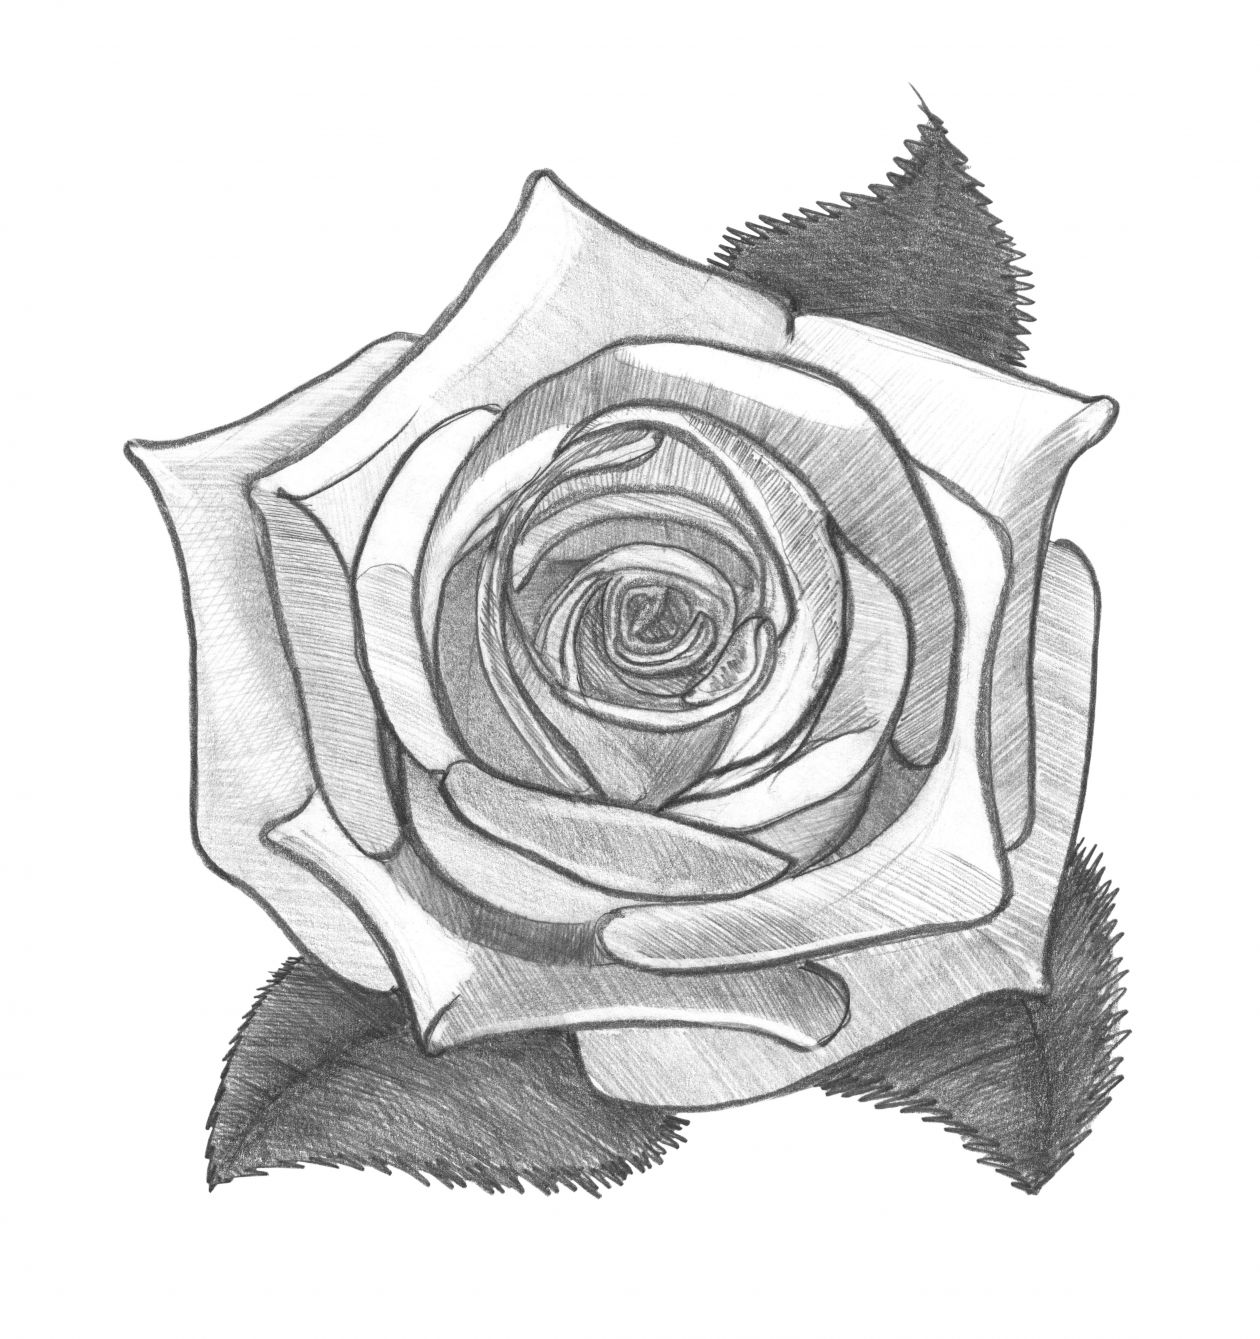 Free photo rose pencil drawing monochrome image